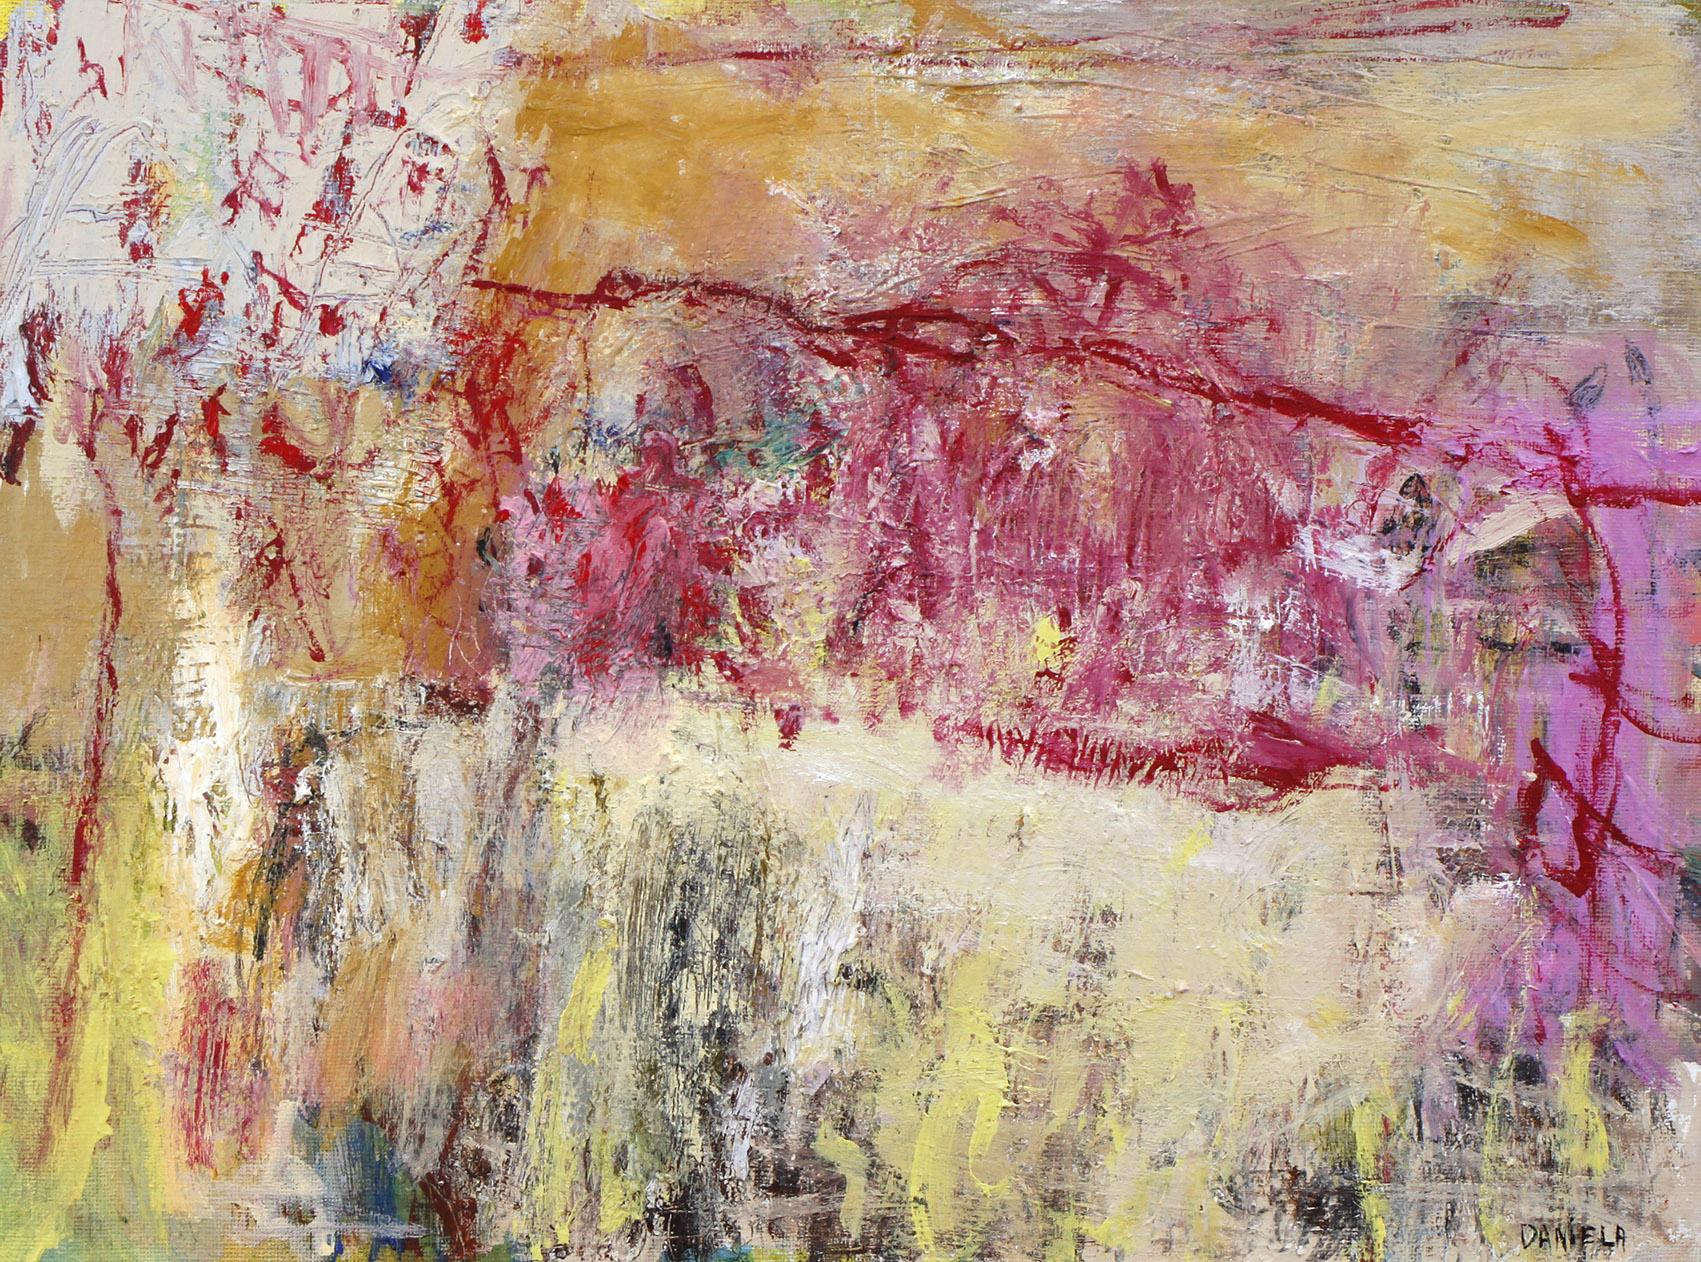 The Corner Store Gallery - Landscape Group Exhibition, artwork by Daniela Cristallo